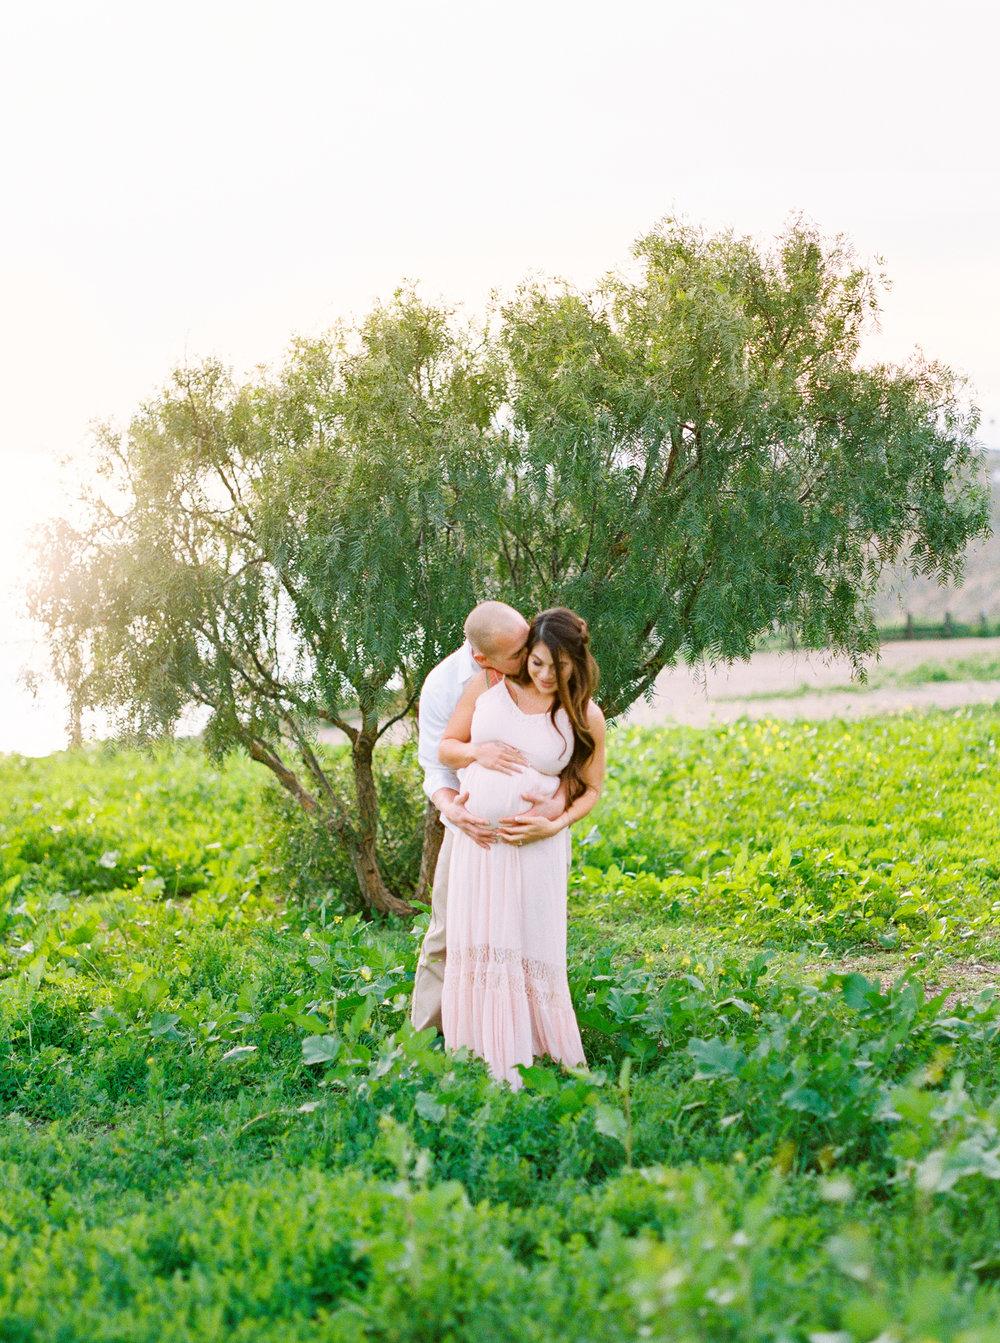 DennisRoyCoronel_AshleyCarsell_Maternity_LosAngeles-28.jpg